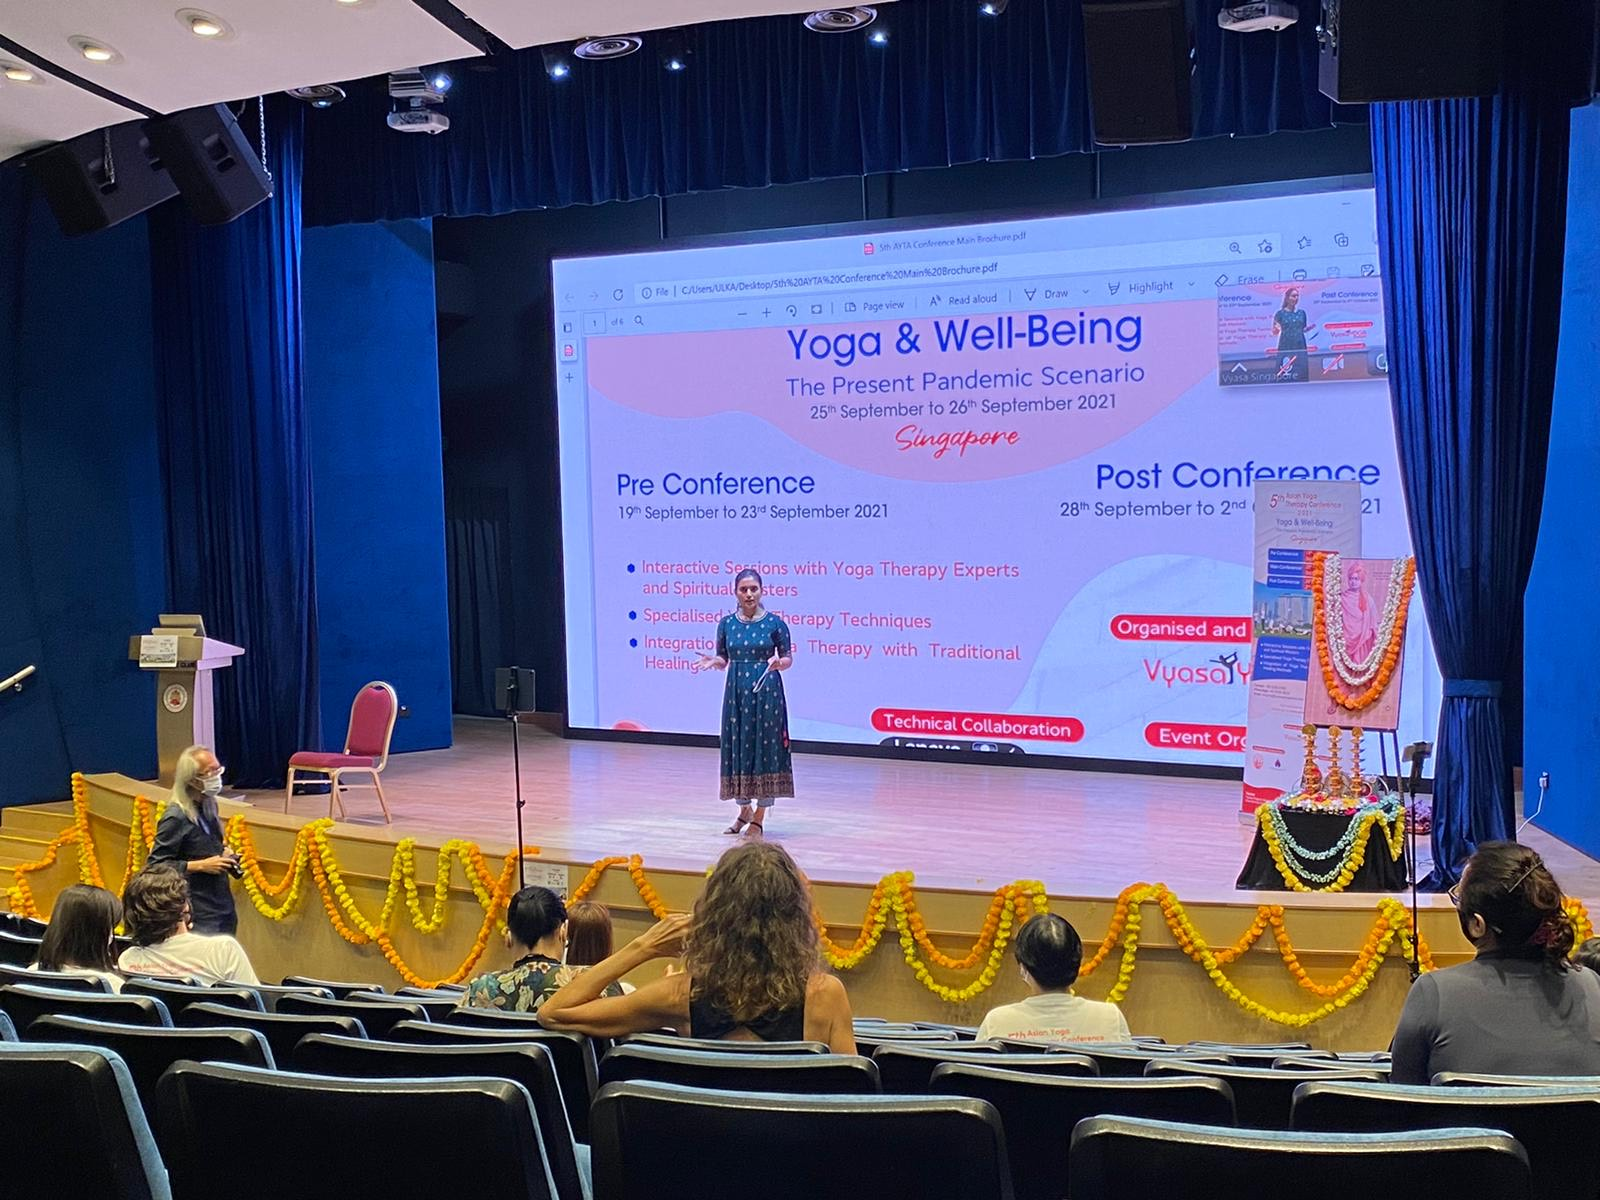 Event summarized to media by Sungapore event MC and media coordinator, Shashikala Venkatappa, Yoga Instructor, Vyasa Singapore